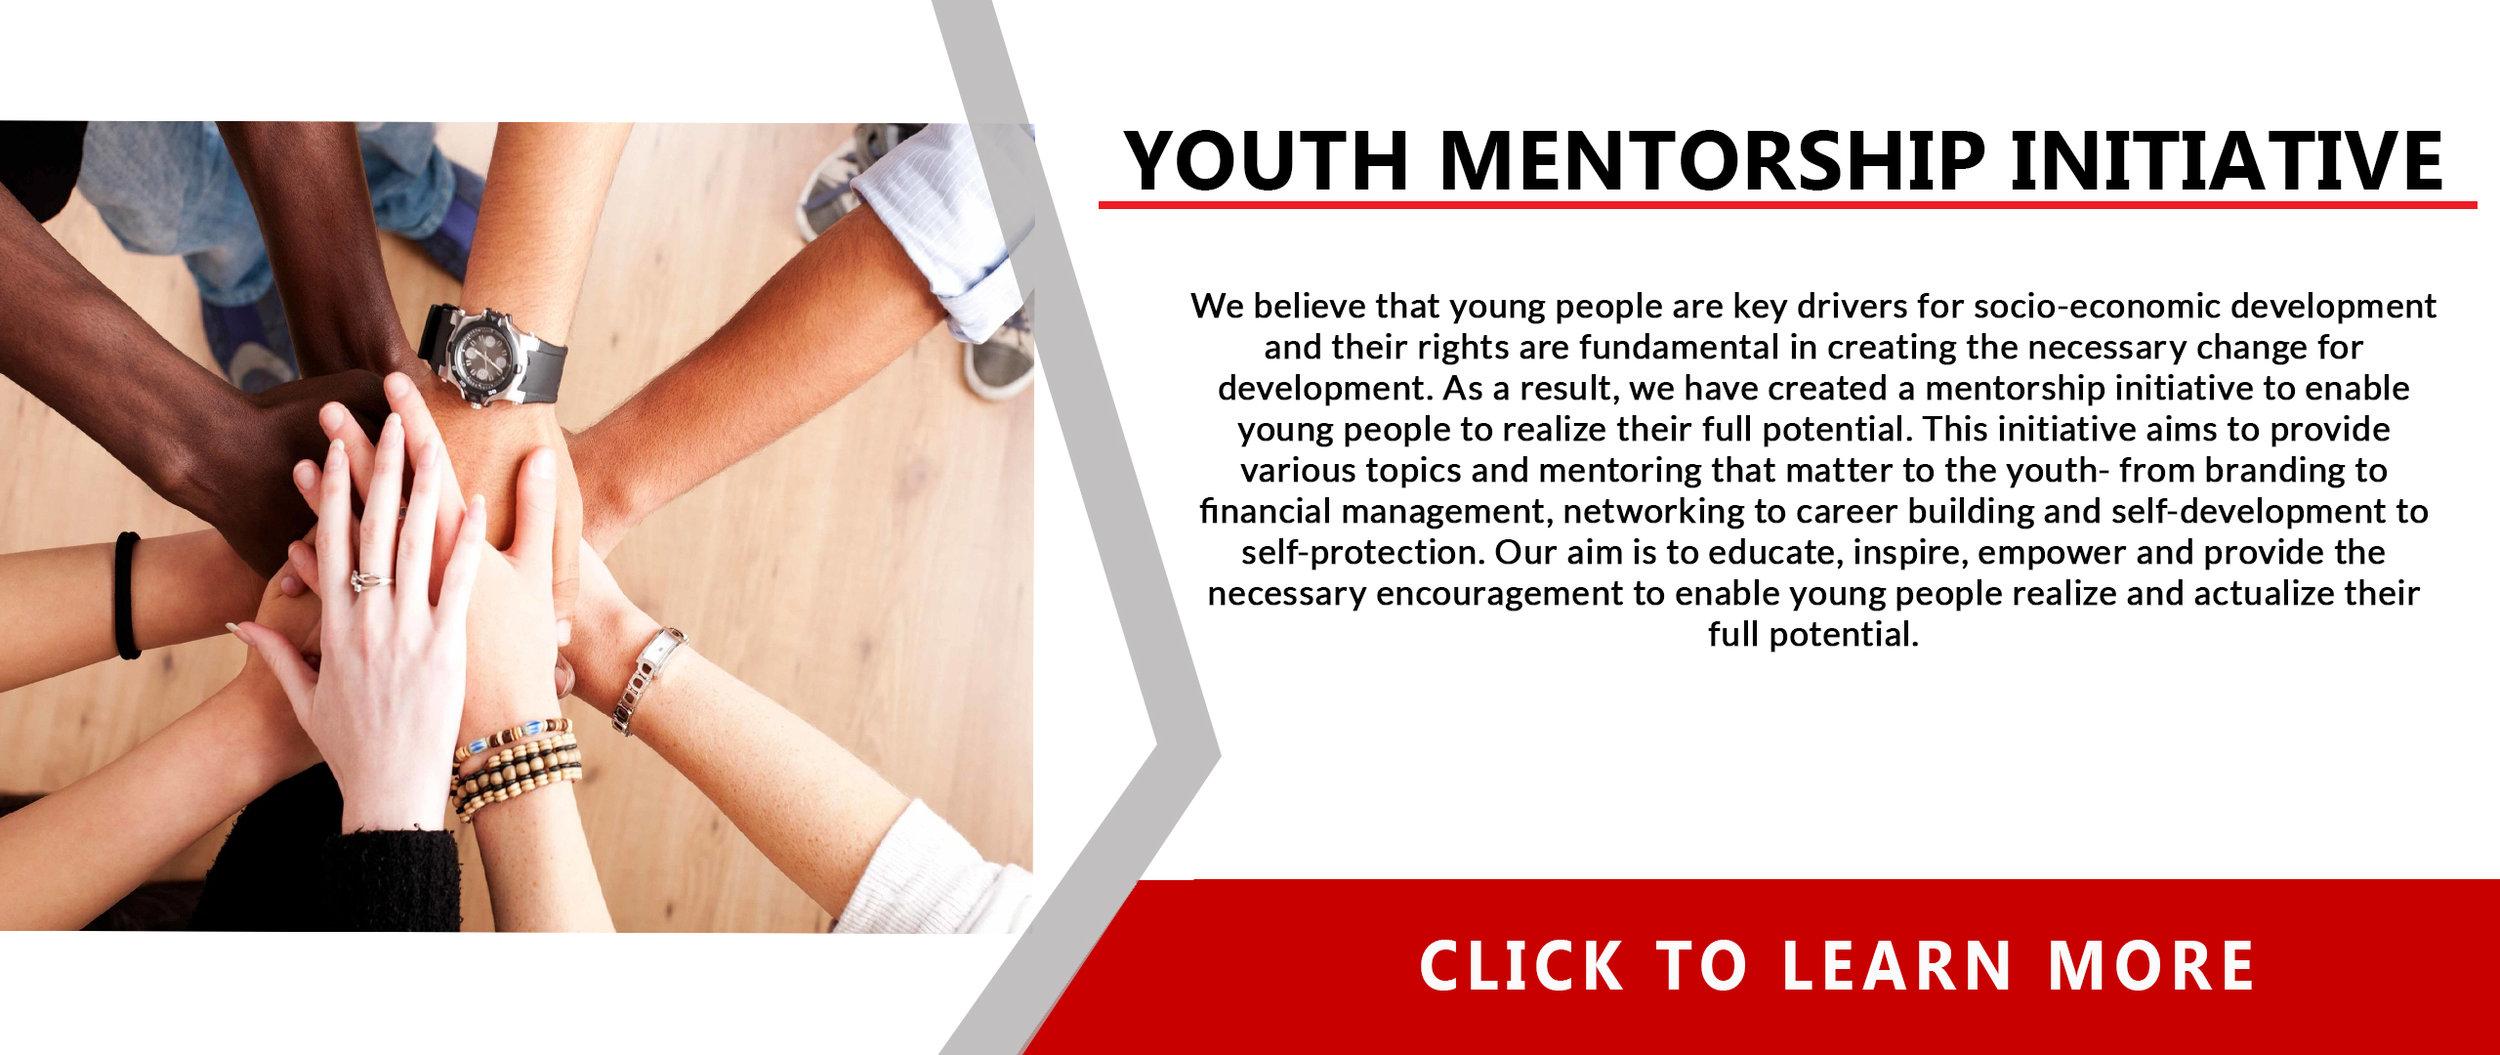 youth mentorship initiative.jpg